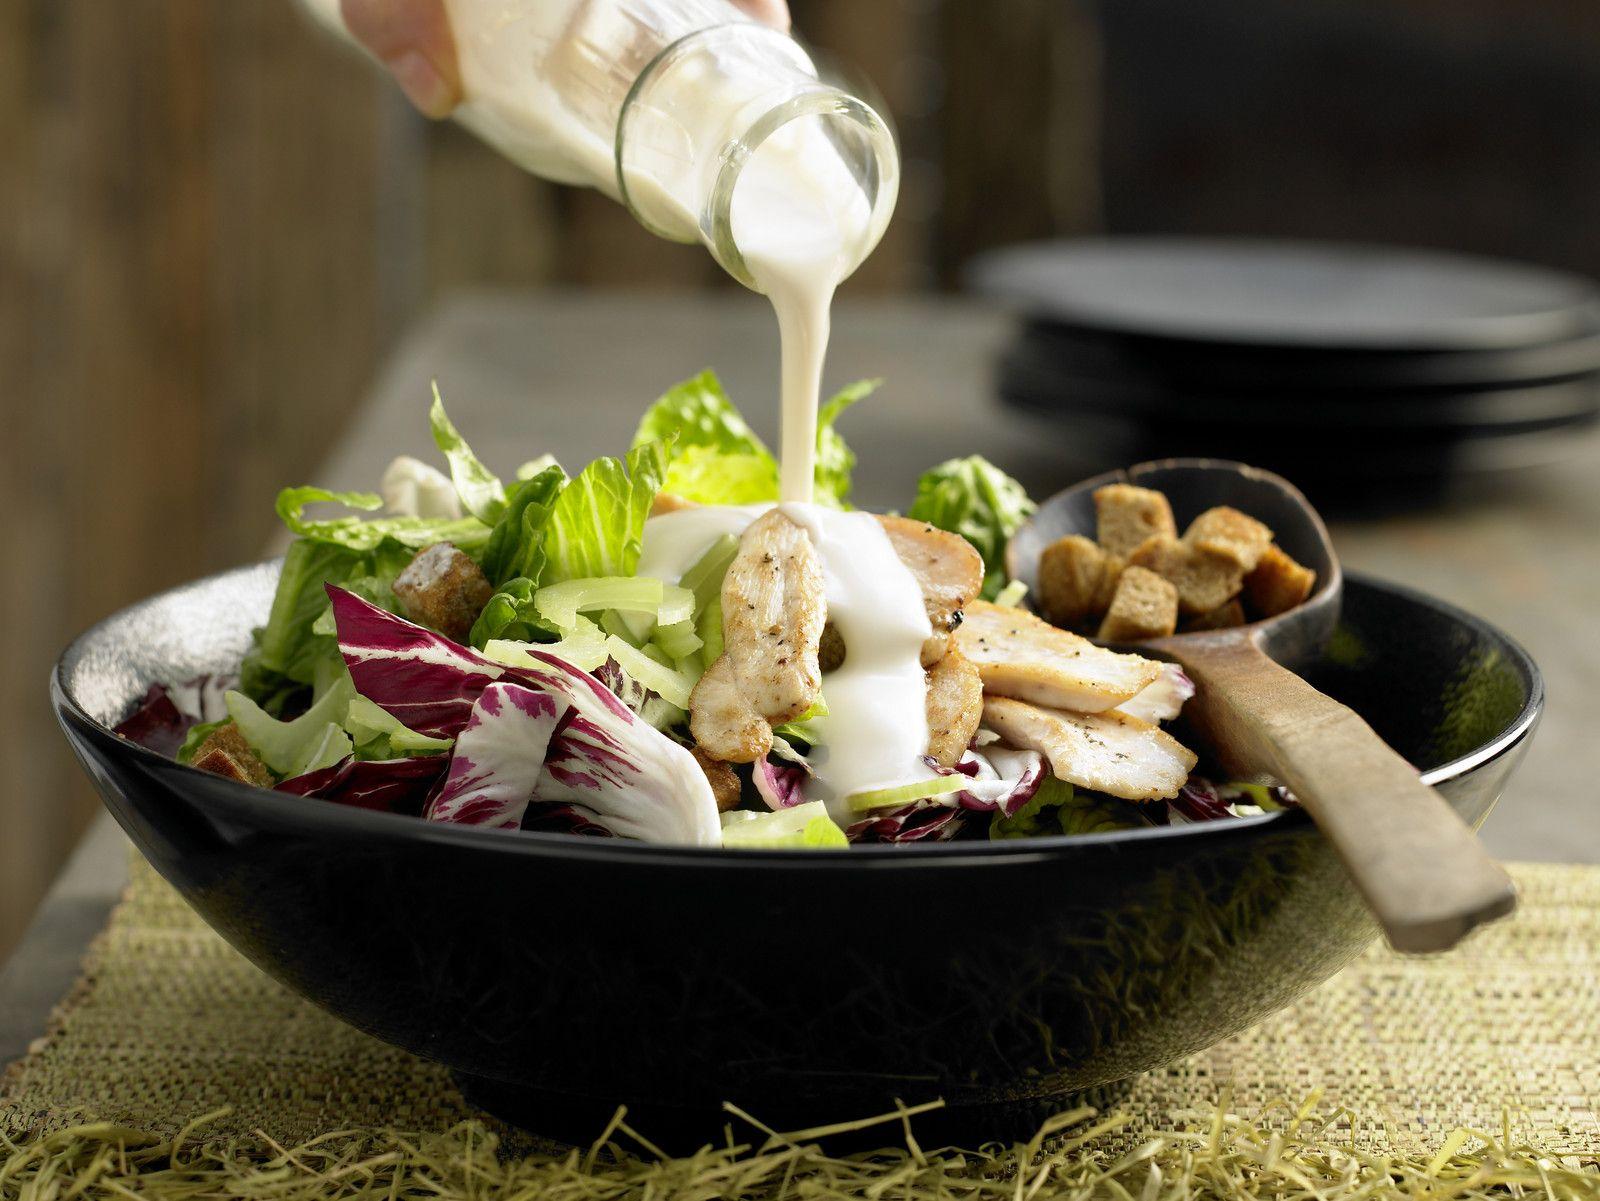 Blattsalat mit Hähnchenstreifen - und Tofu - smarter - Kalorien: 304 Kcal - Zeit: 30 Min. | eatsmarter.de